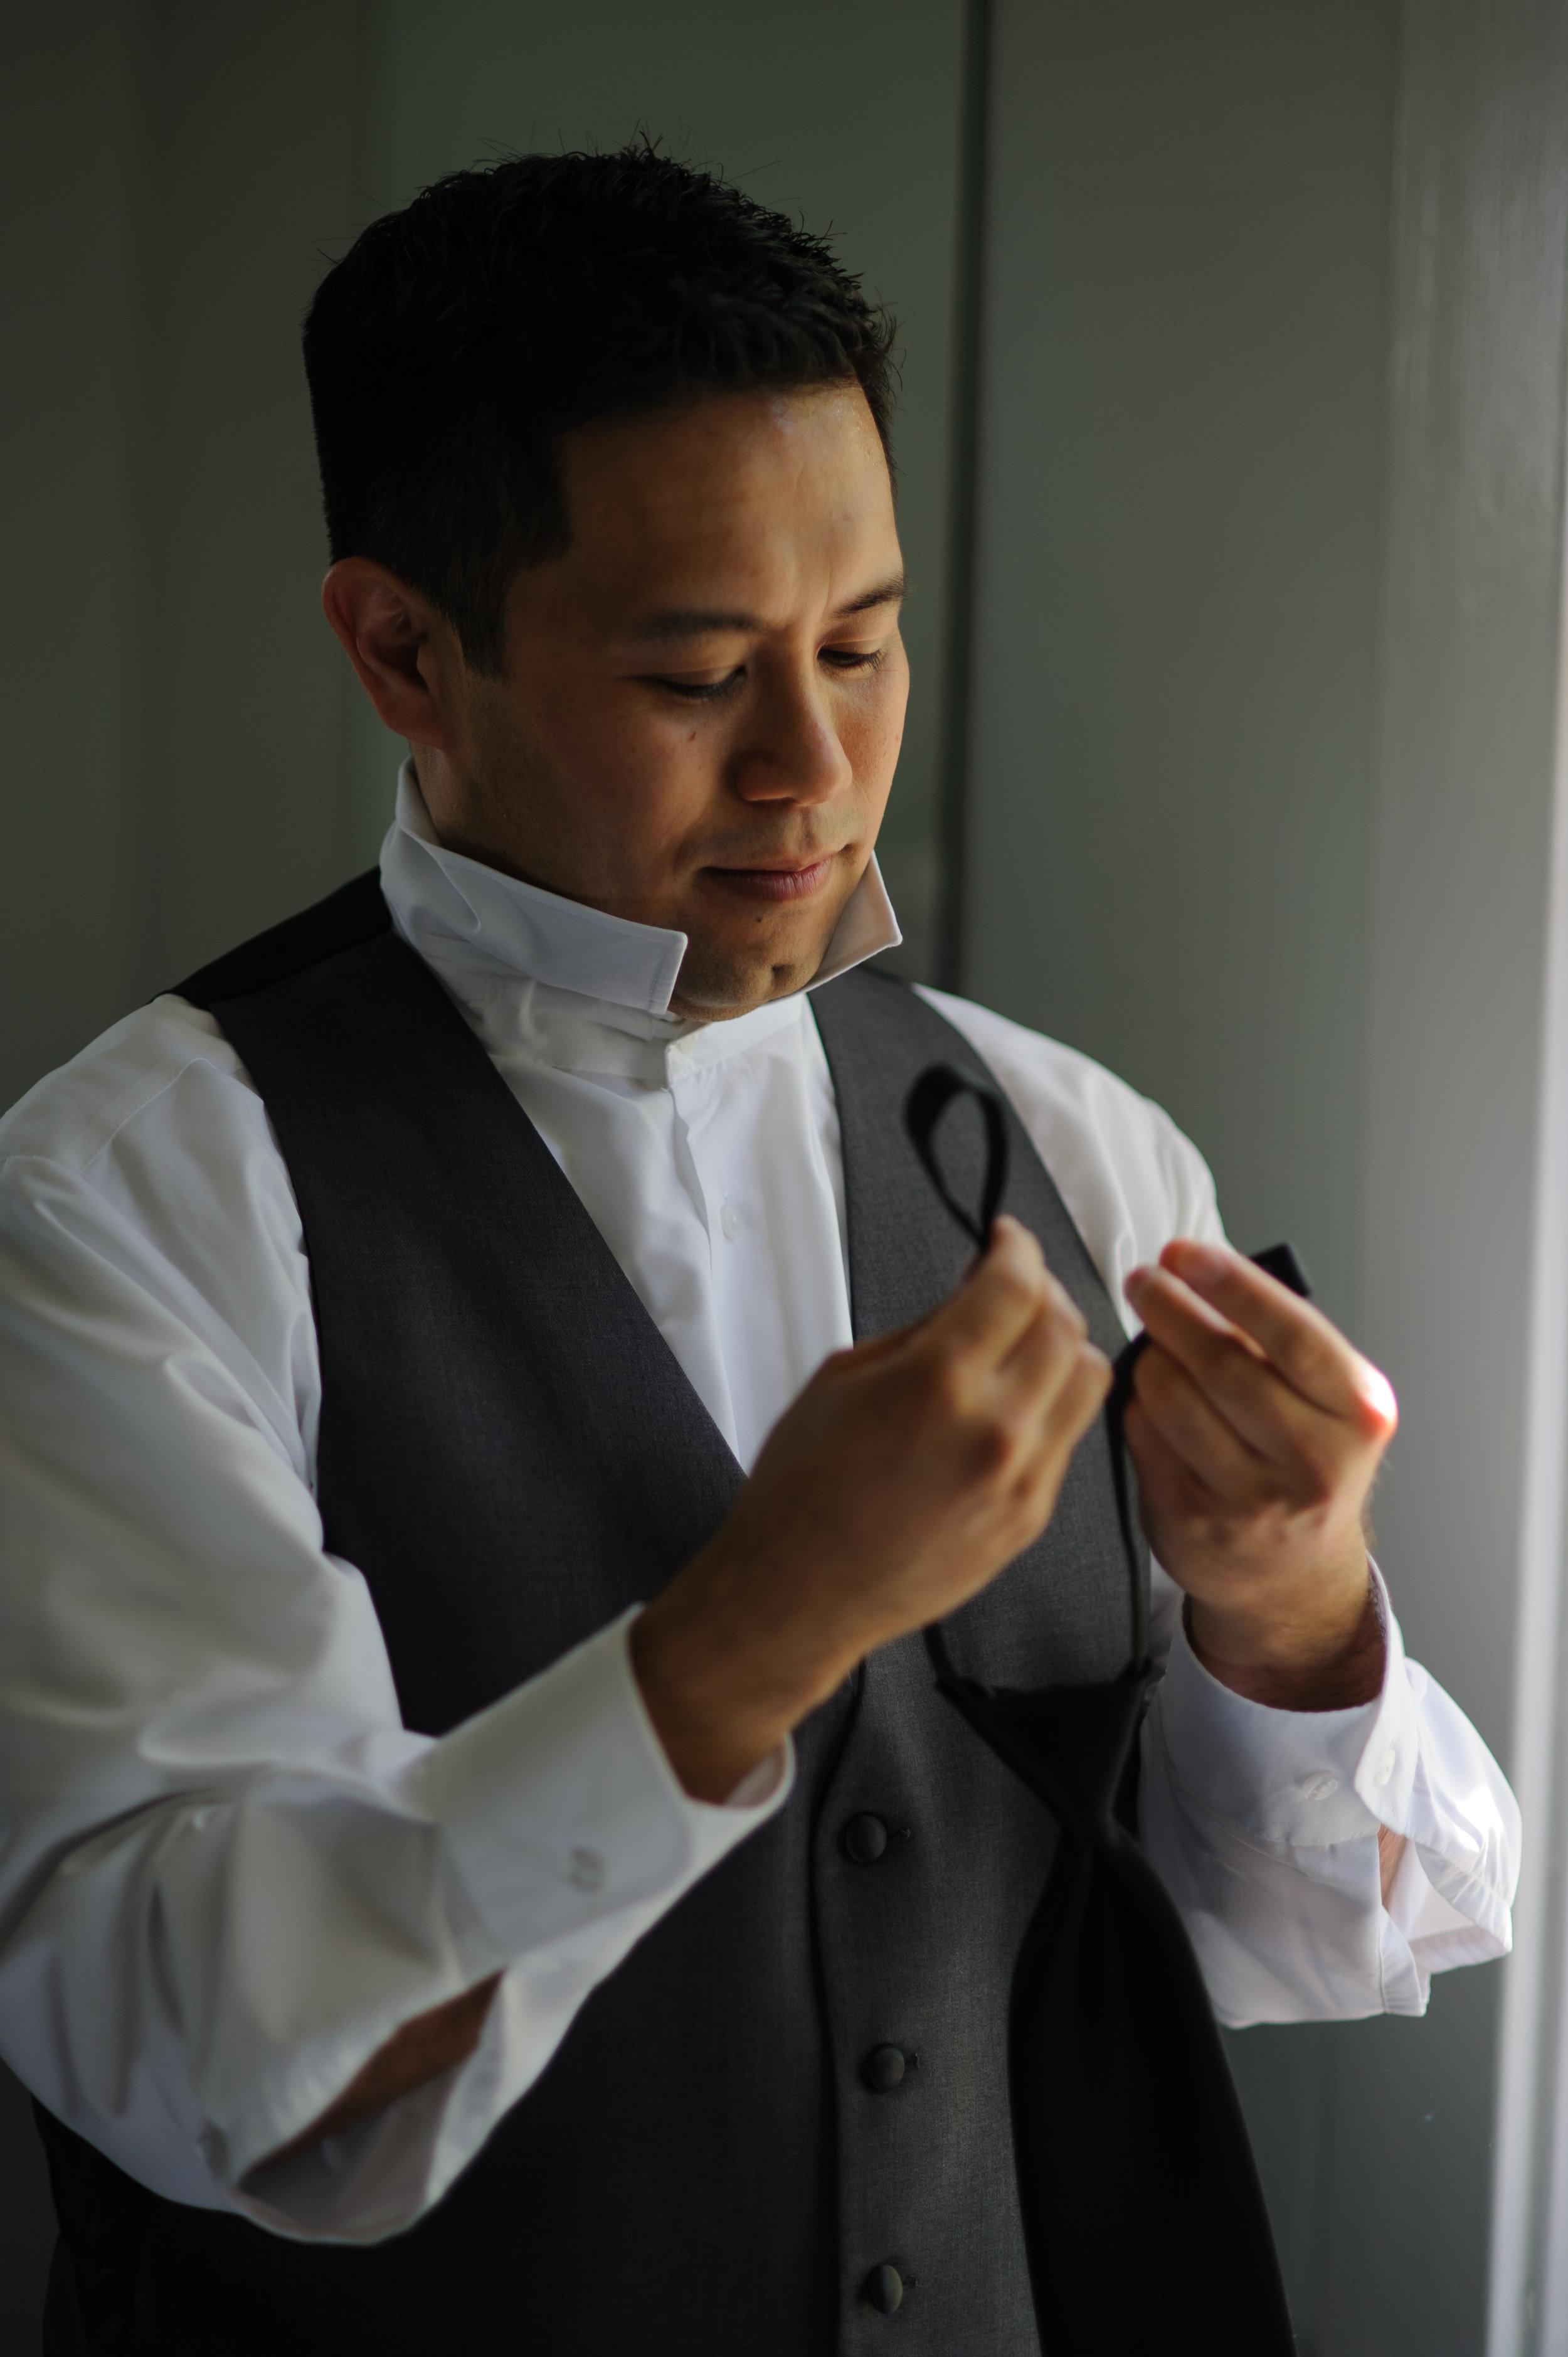 susan-brad-005-sacramento-wedding-photographer-katherine-nicole-photography.JPG